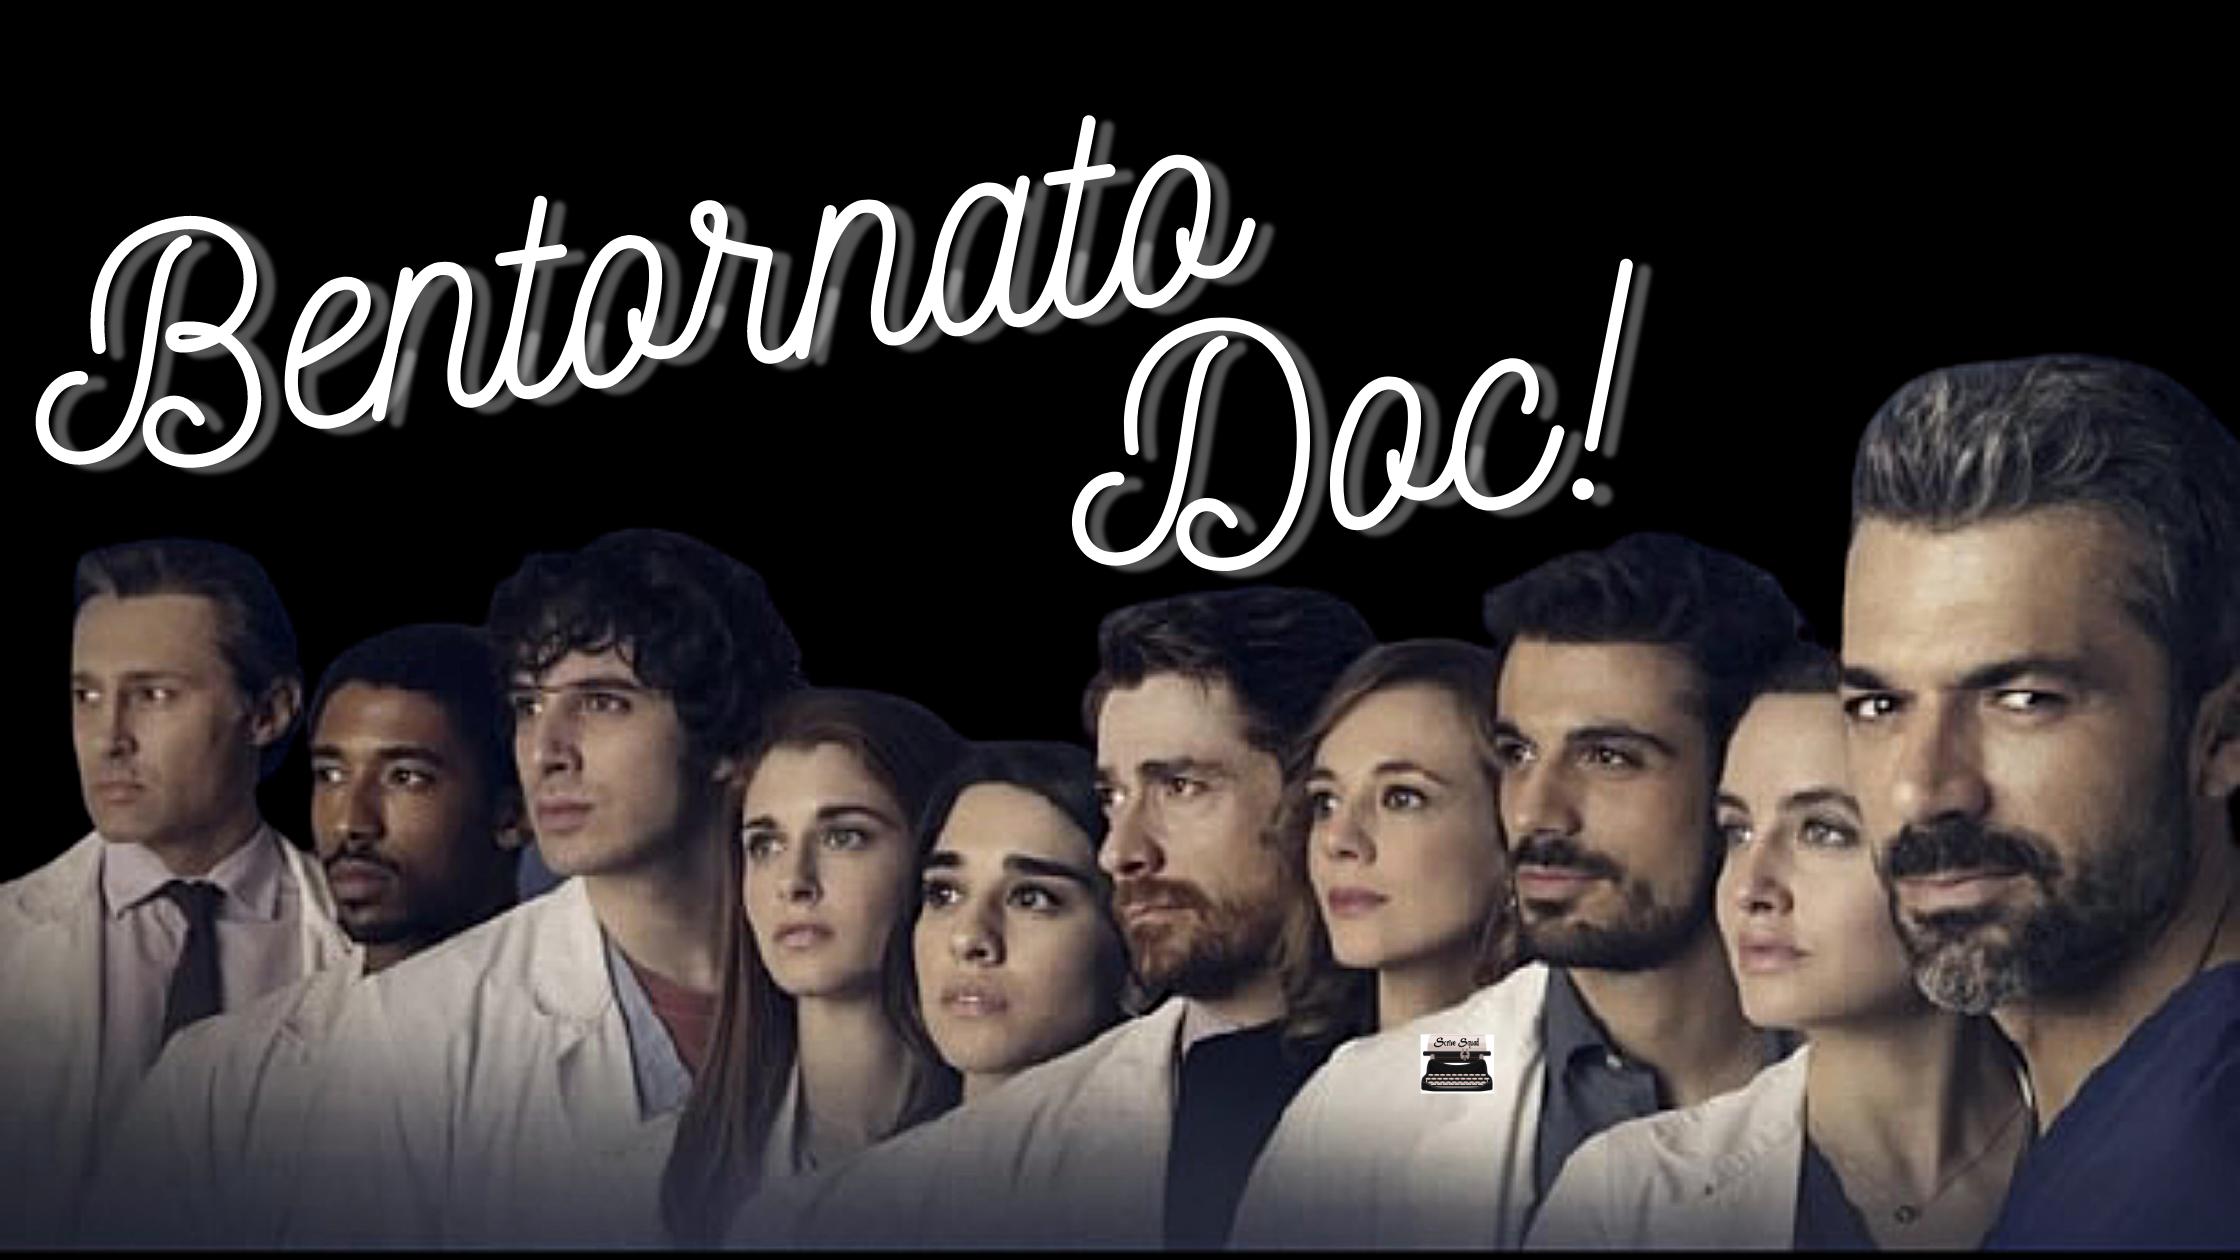 bentornato DOC